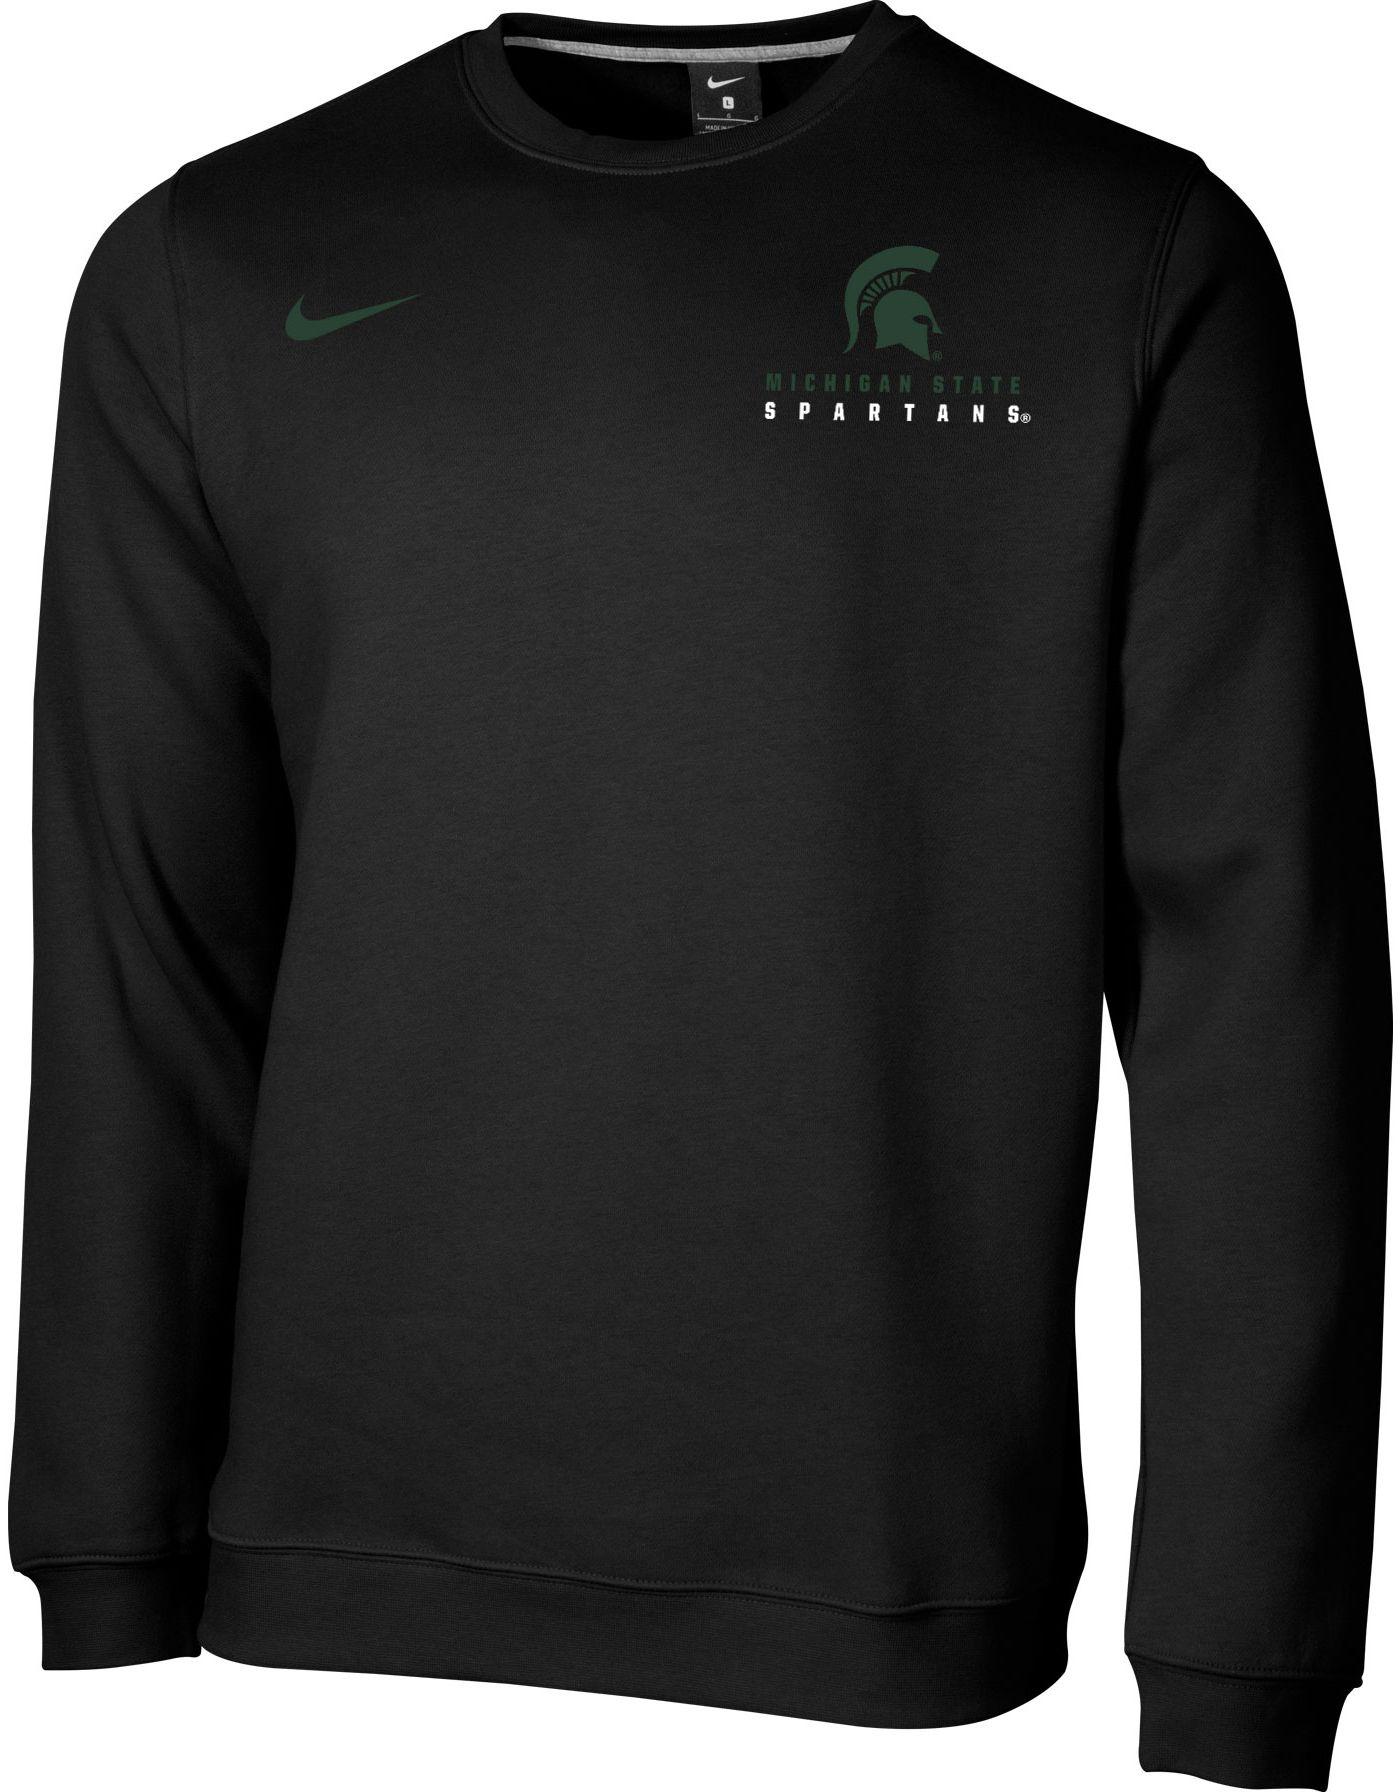 Nike Men's Michigan State Spartans Club Fleece Crew Neck Black Sweatshirt